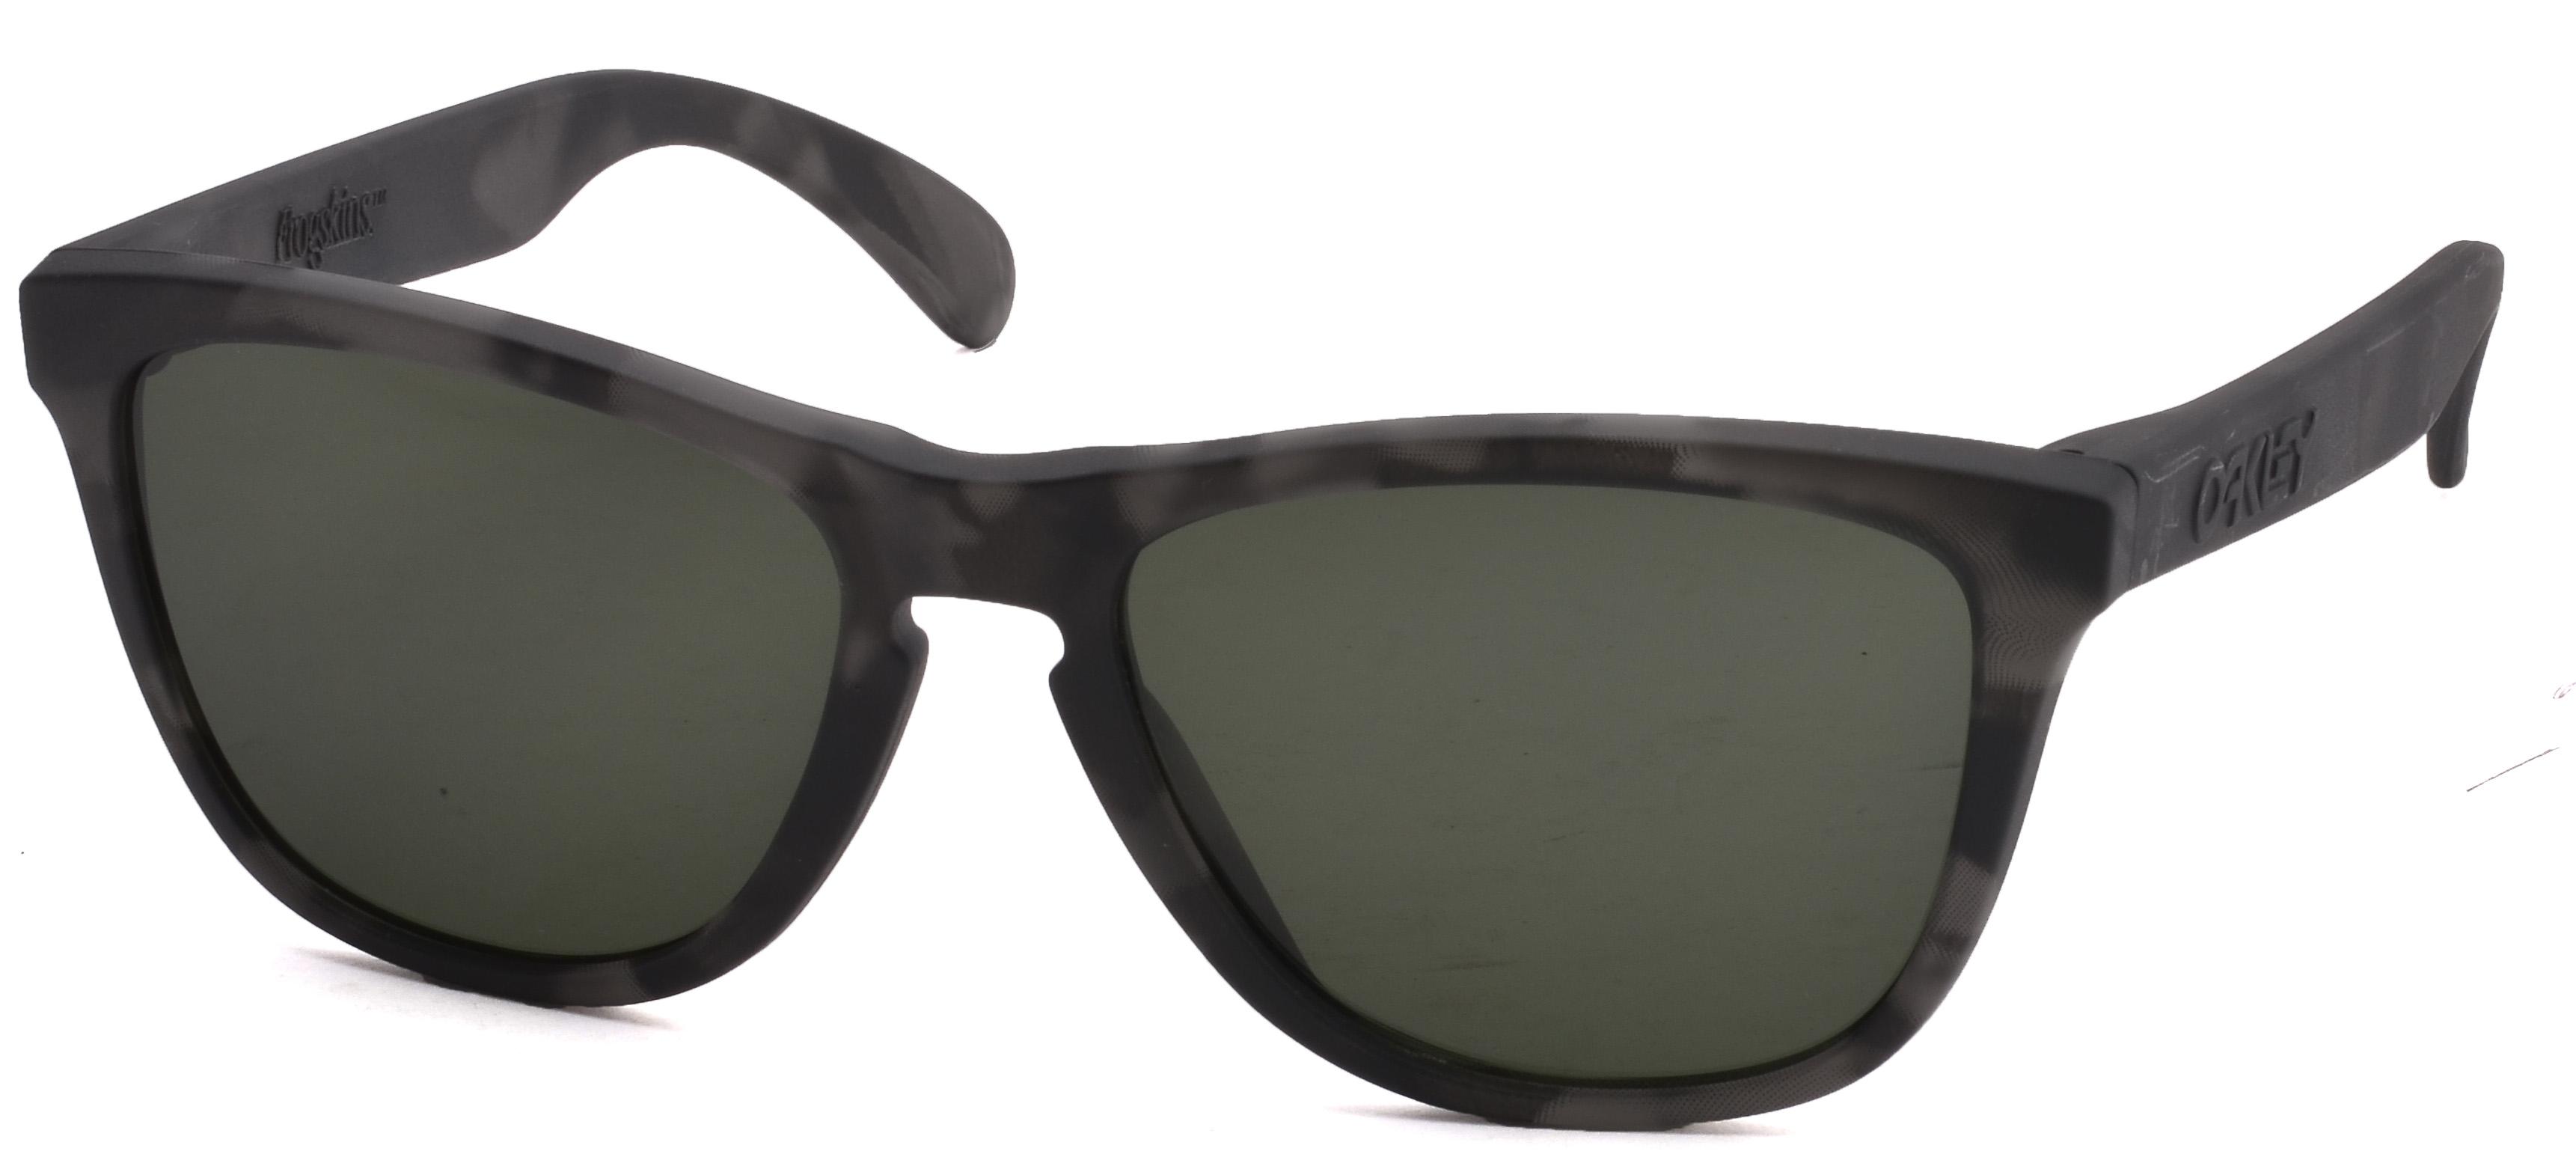 crosshoakley frogskins rootbeer  oakley men\'s sunglasses